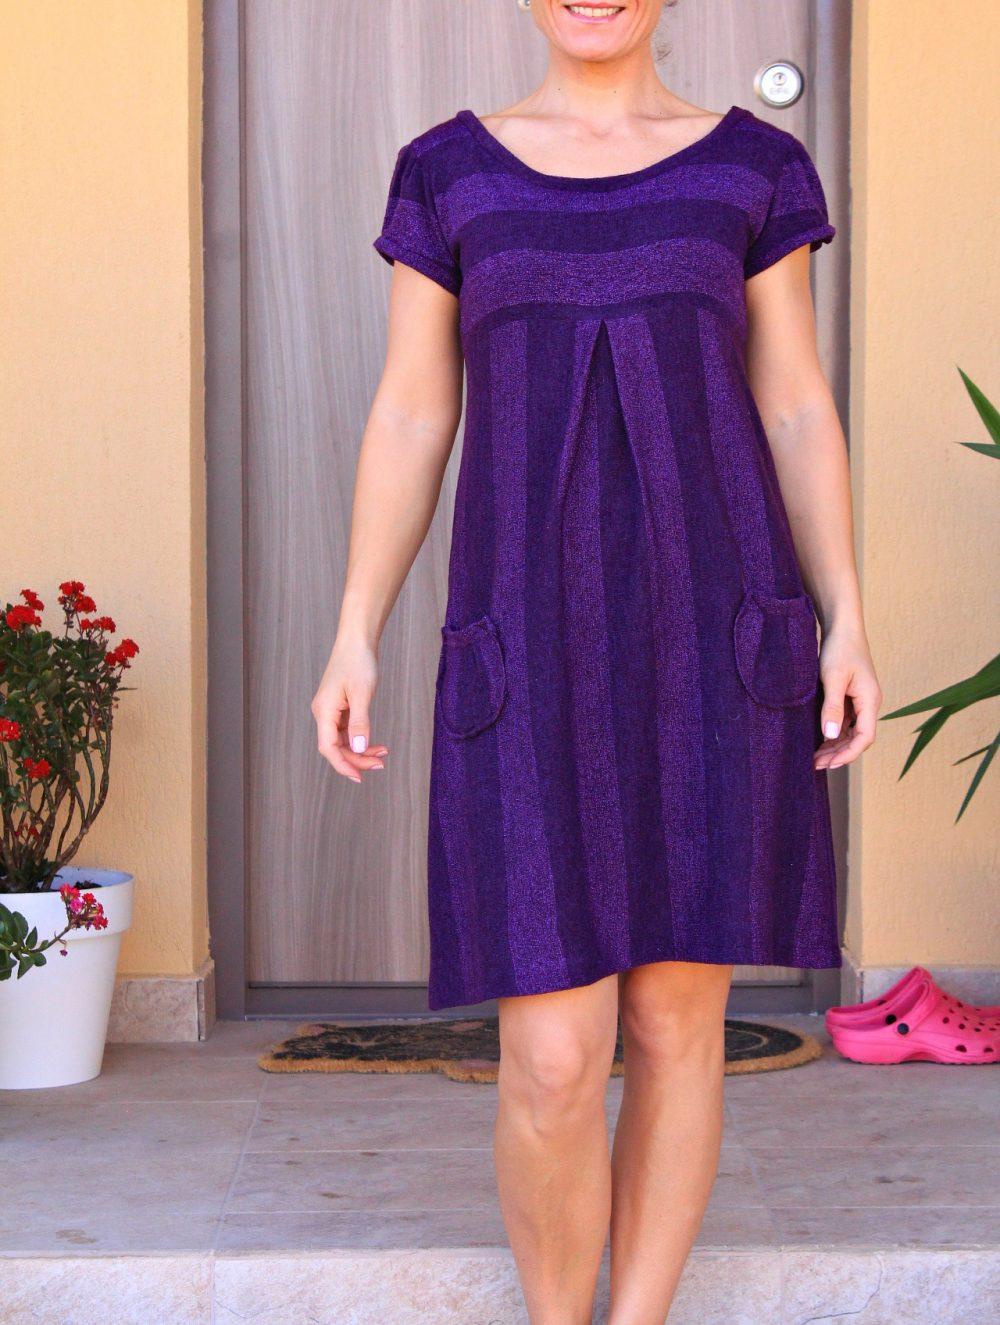 dress pattern making tutorial